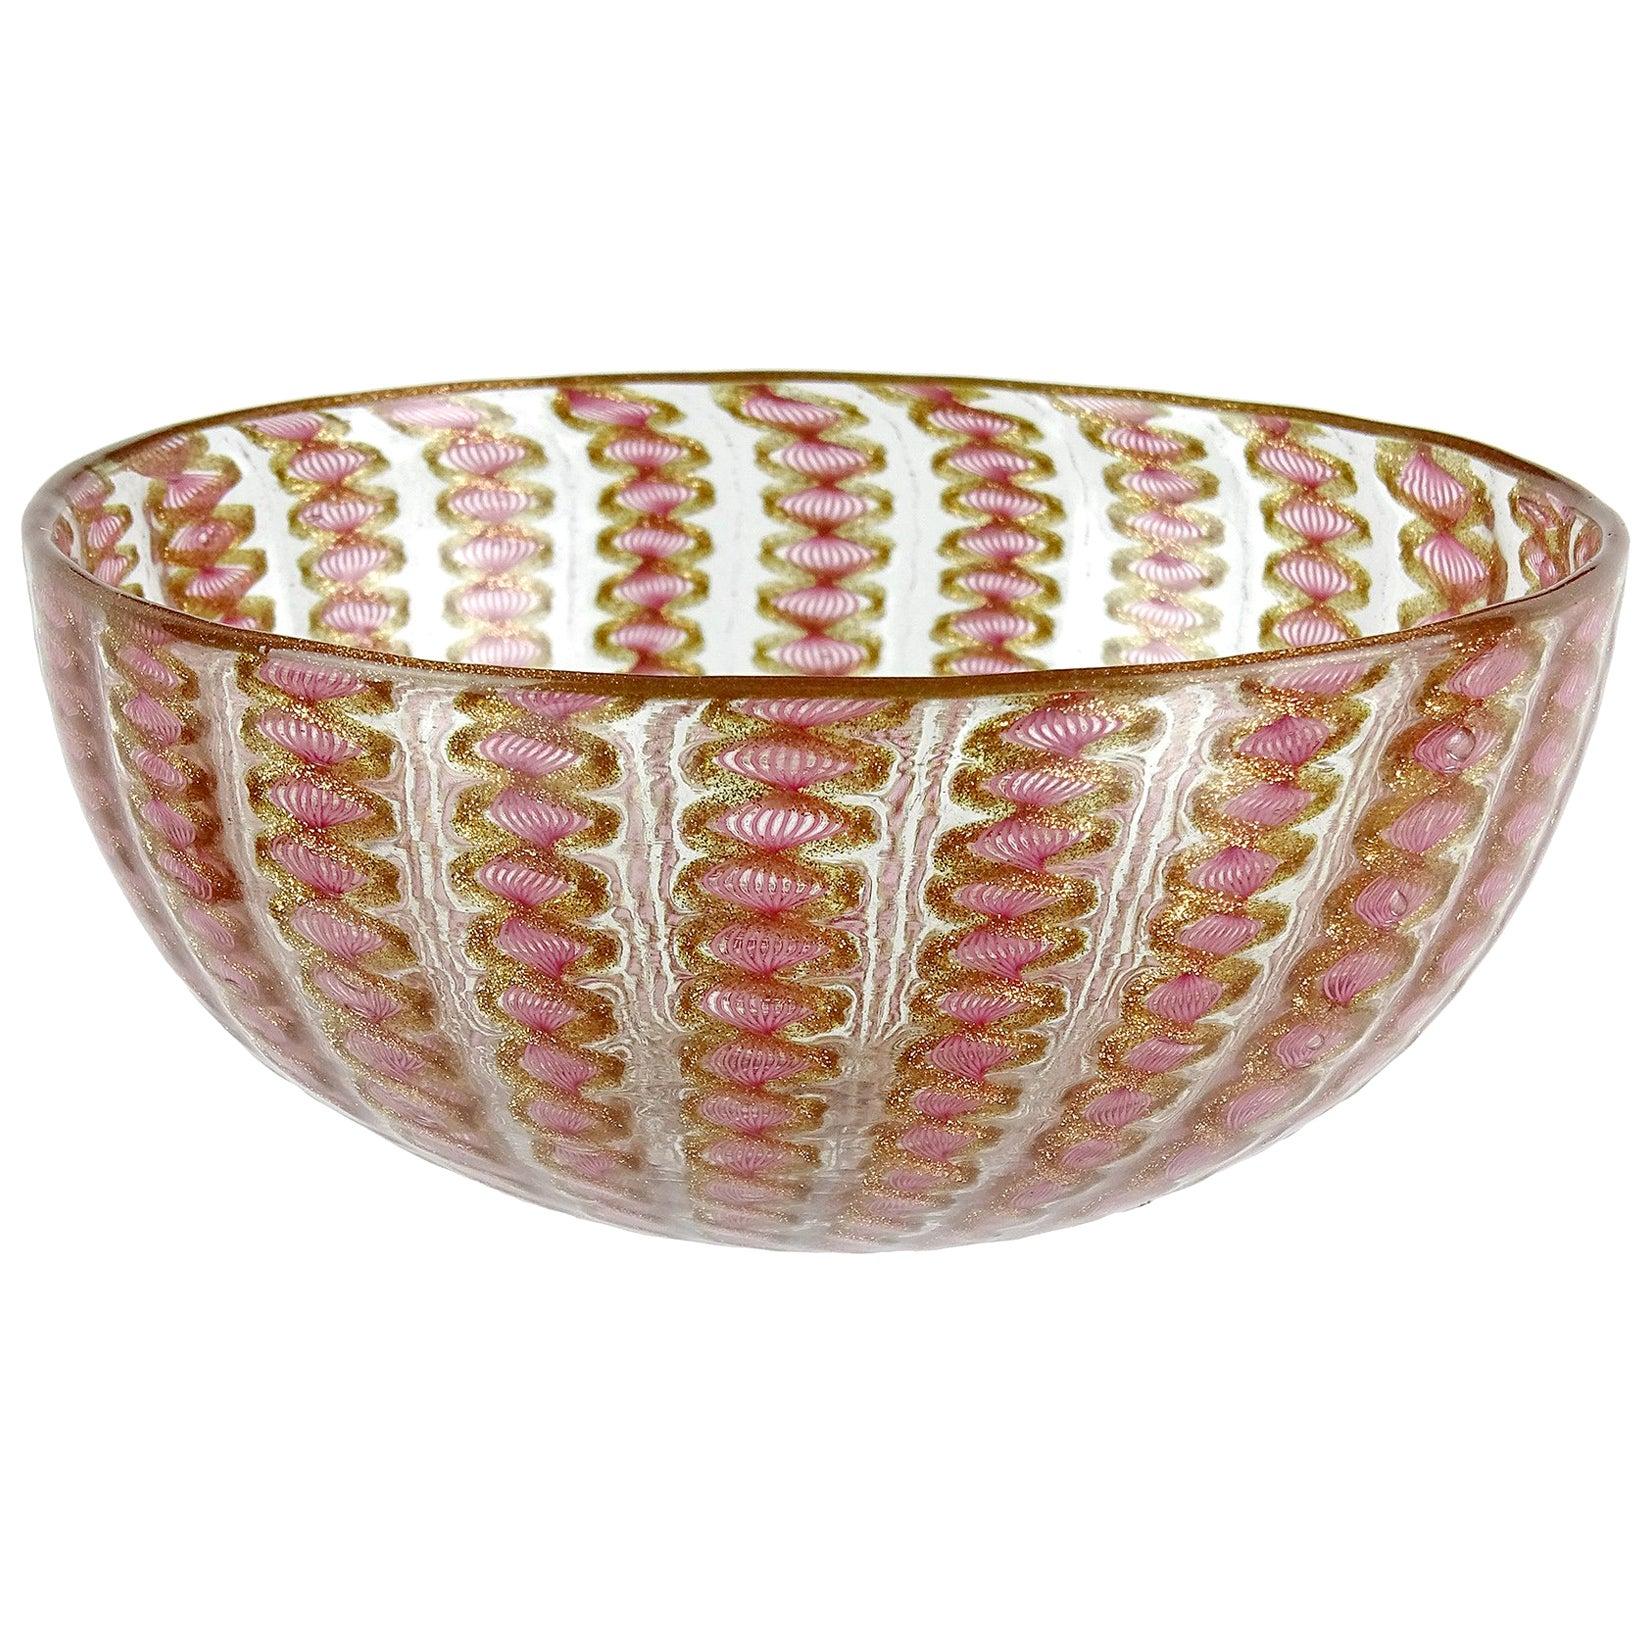 Salviati Venetian Antique Pink Ribbons Aventurine Italian Art Glass Dish Bowl